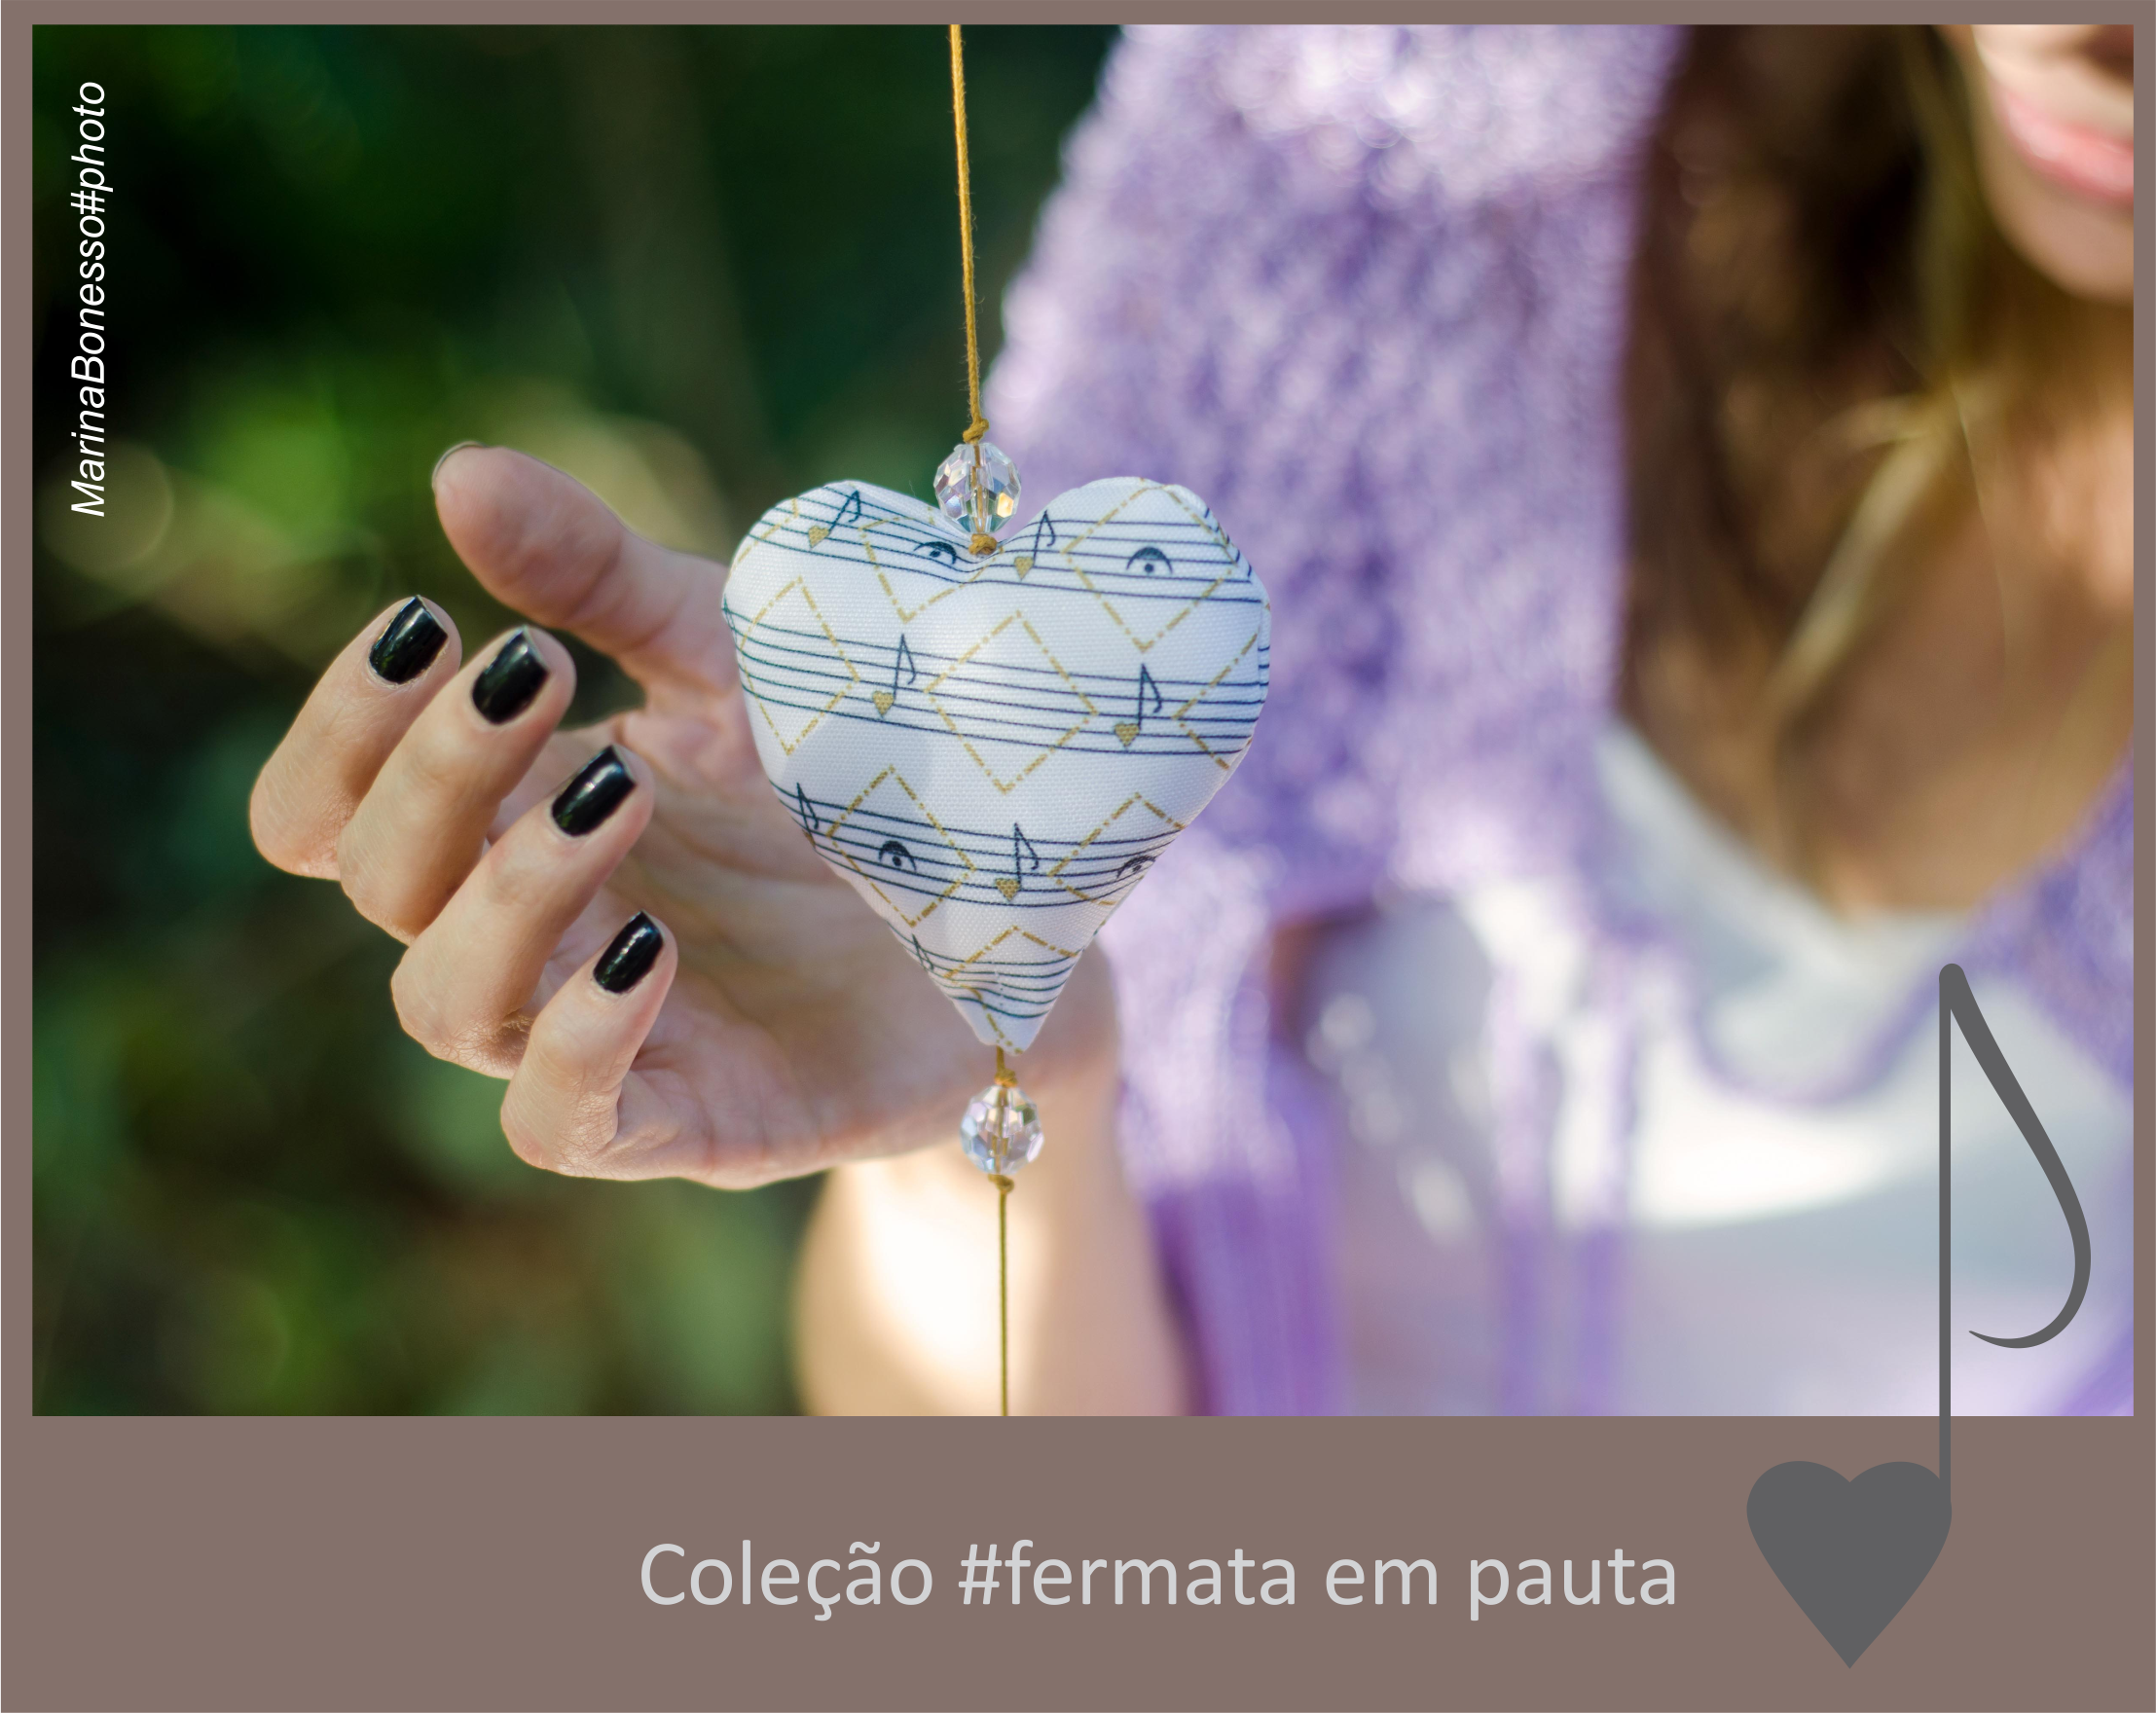 fermata_em_pauta